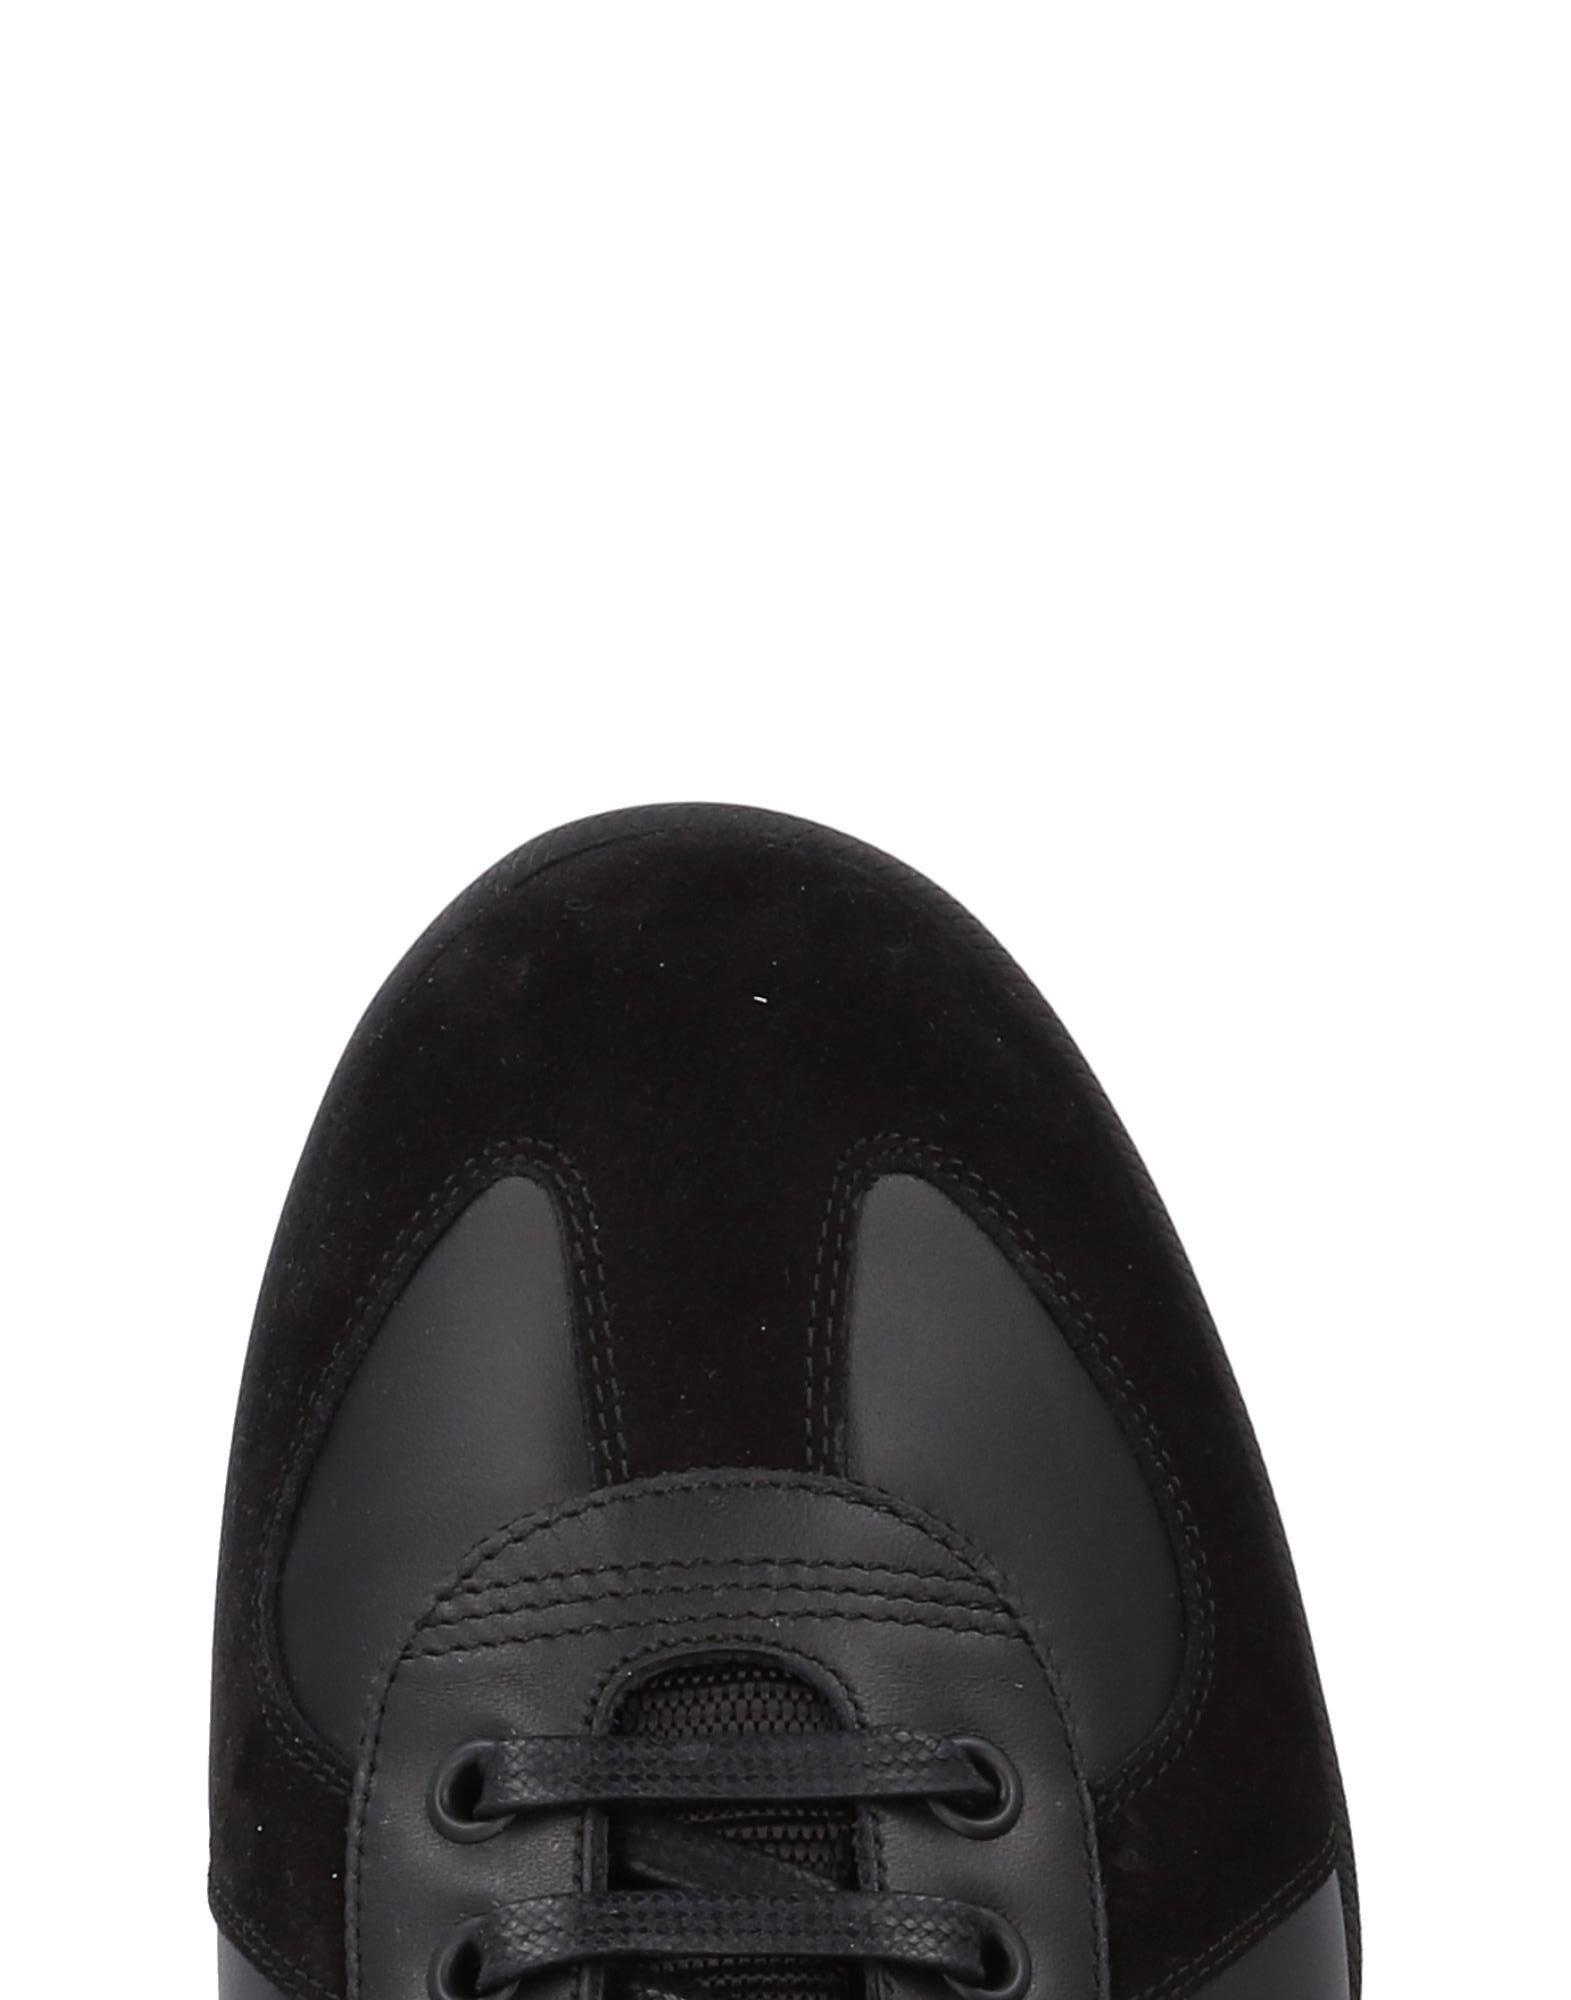 Sneakers Dior Homme Femme Sneakers Dior Homme sur - imsafterparty.com 27302c0b824